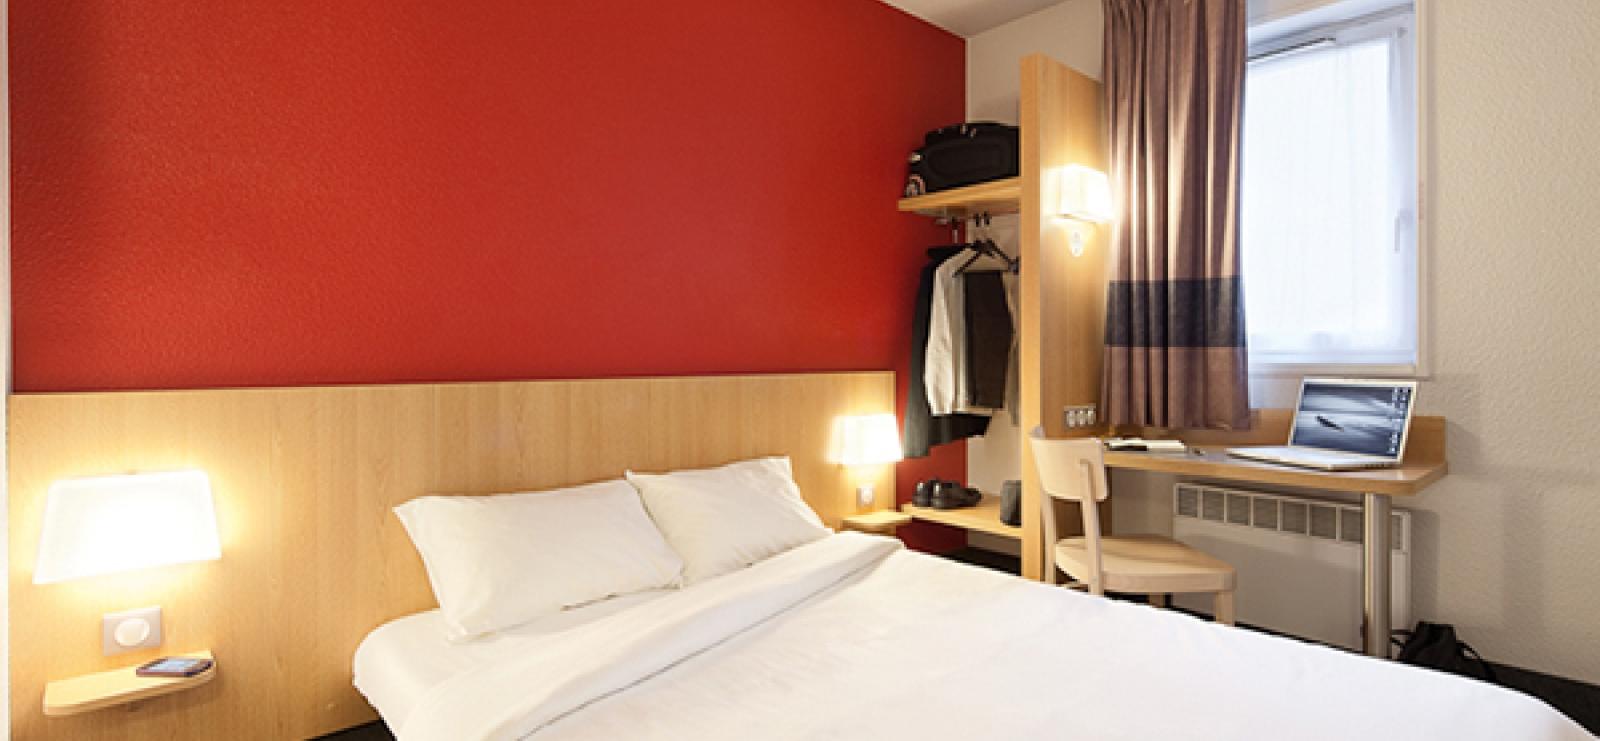 Hotel B&B Roquebrune